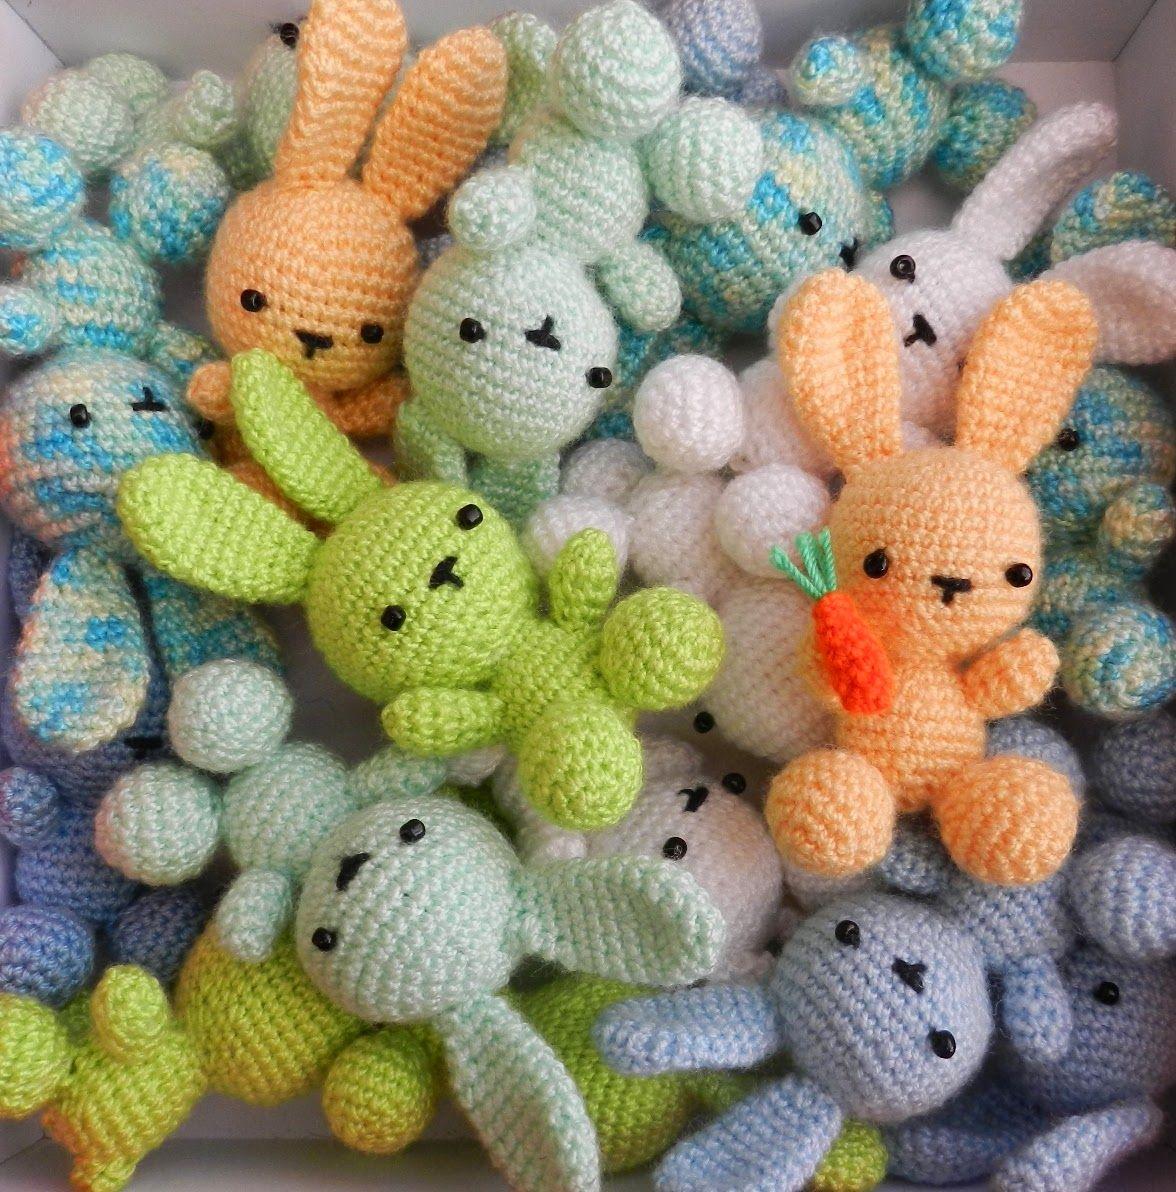 daxa rabalea: Conejos a granel + patrón | Crochet <3! | Pinterest ...